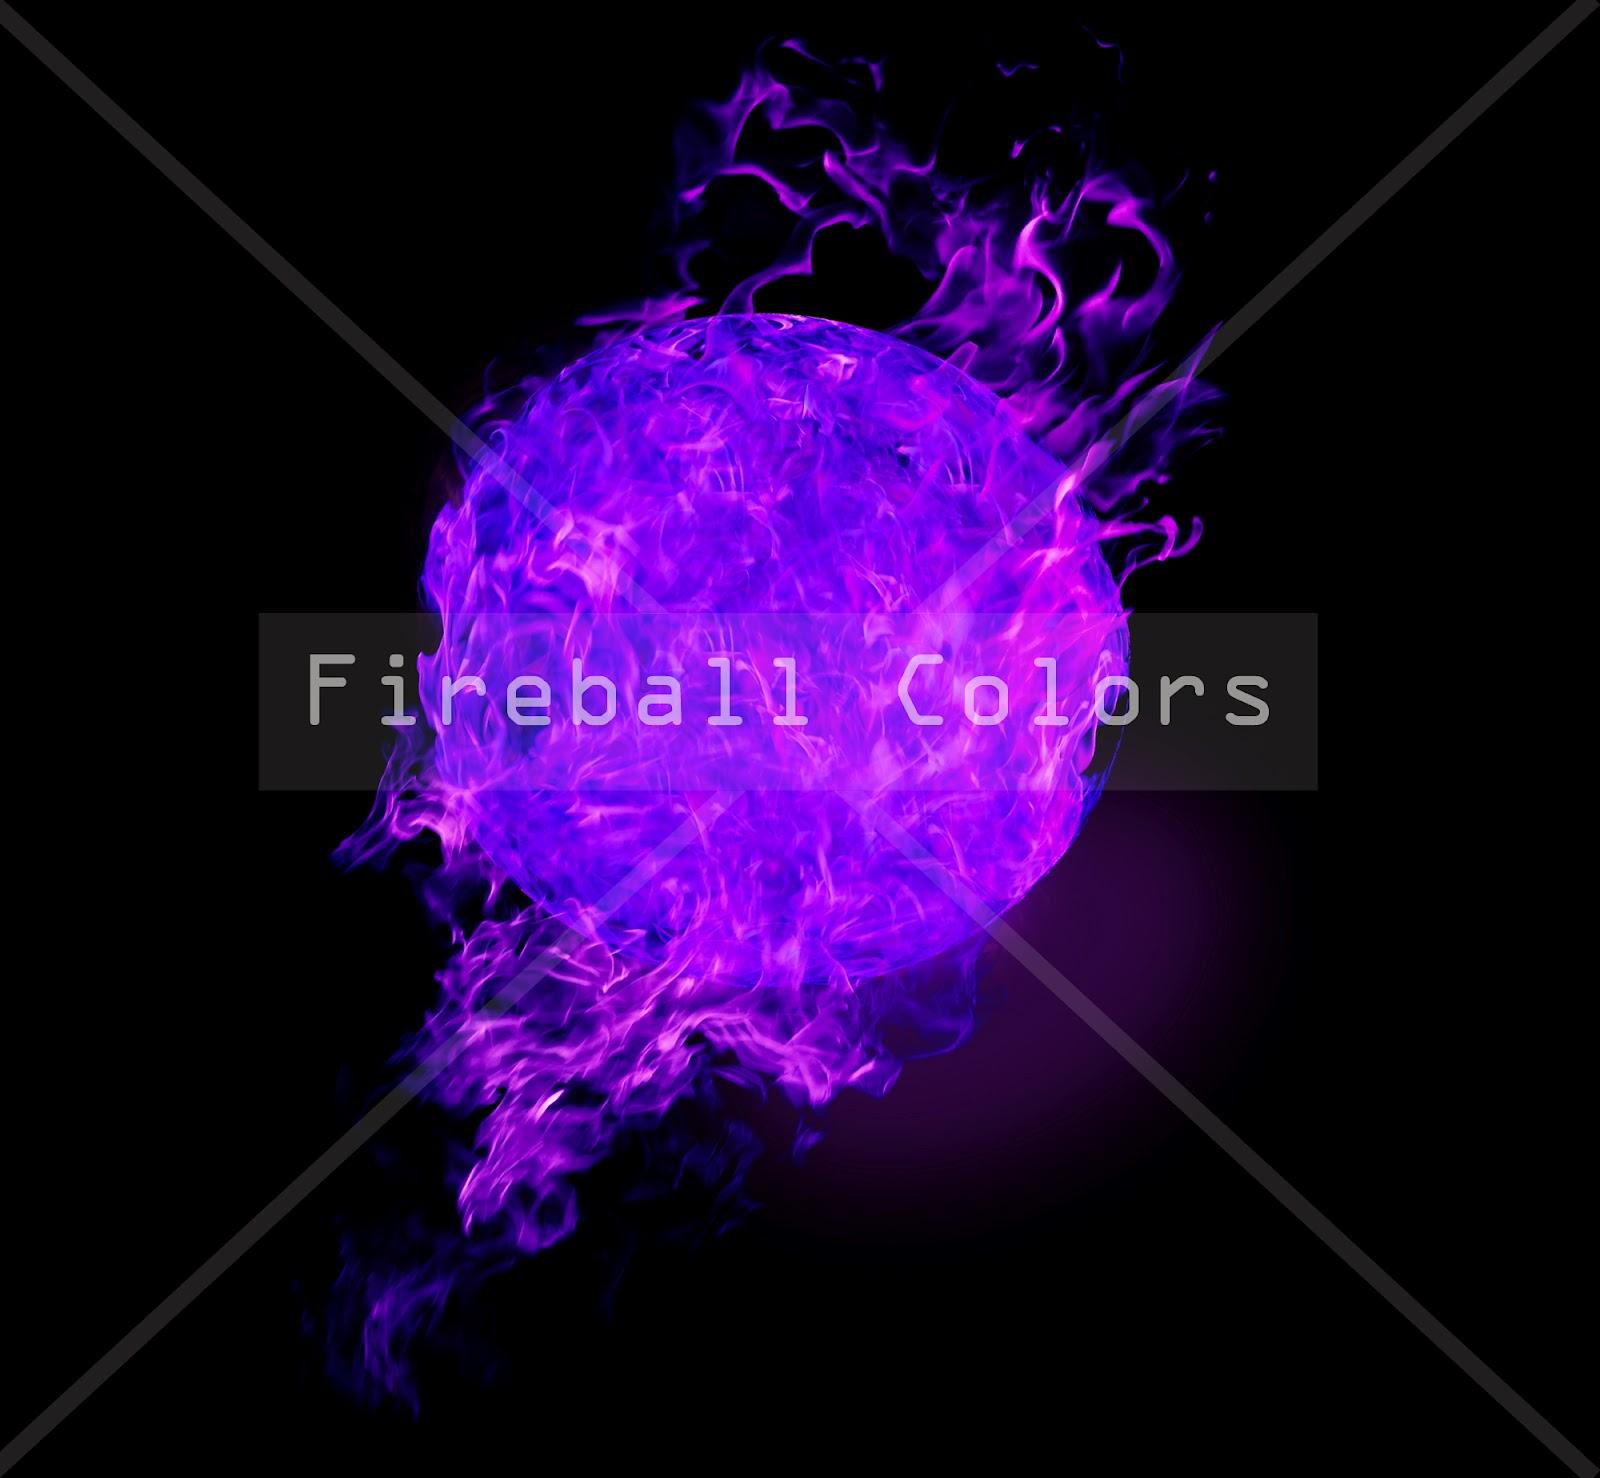 fireball colors  fireball colors vector